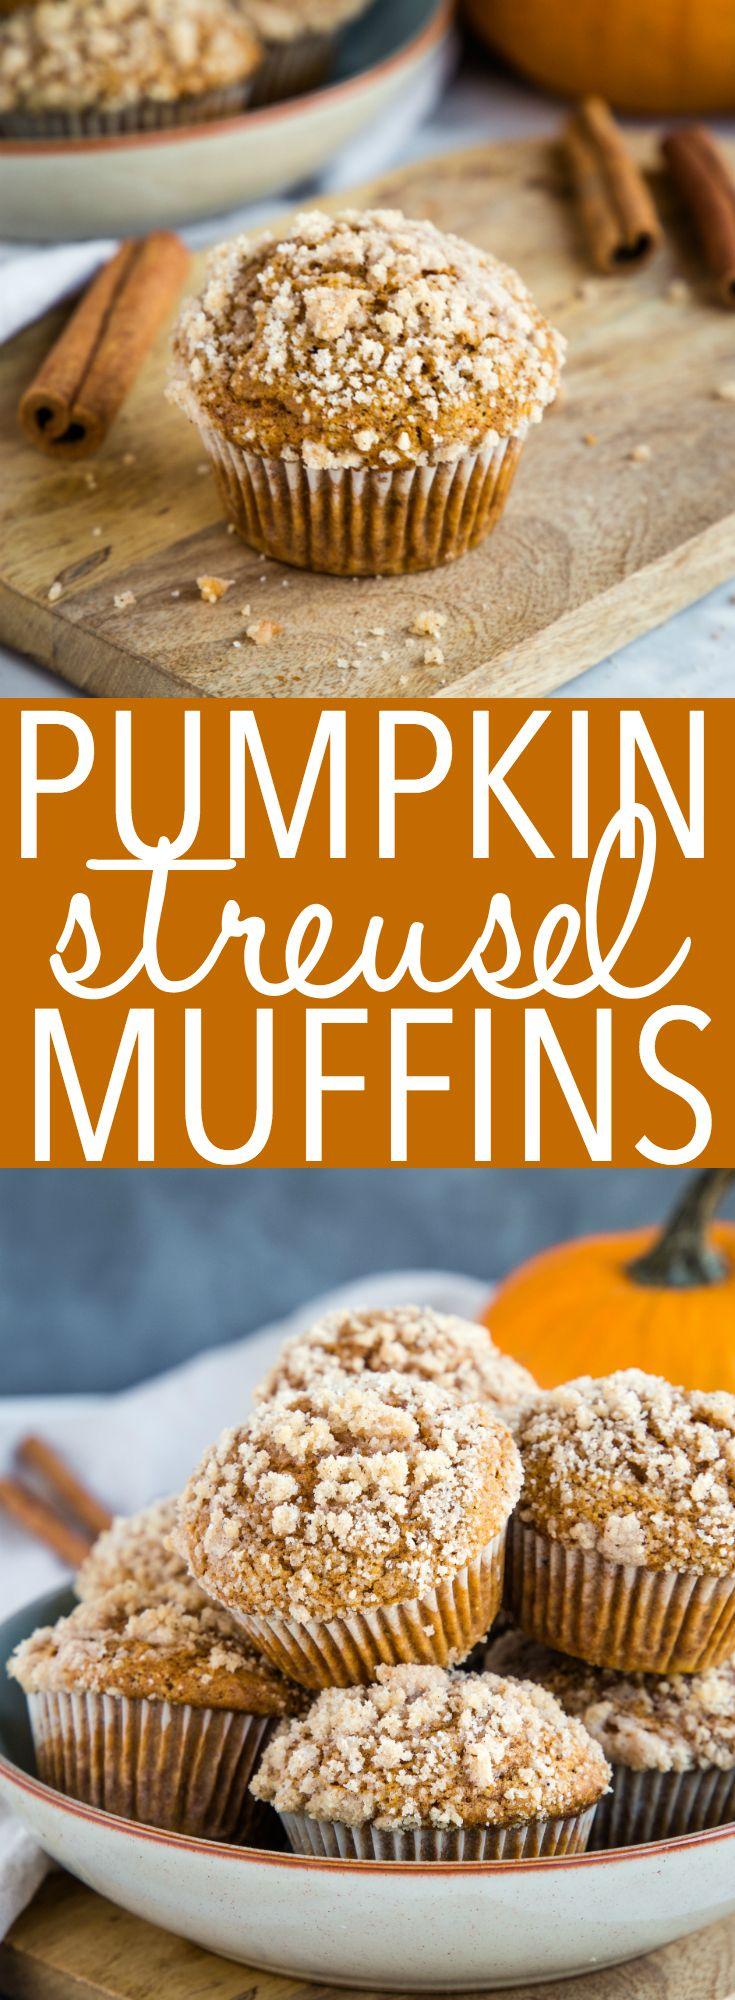 Pumpkin Spice Streusel Muffins #pumpkinmuffins